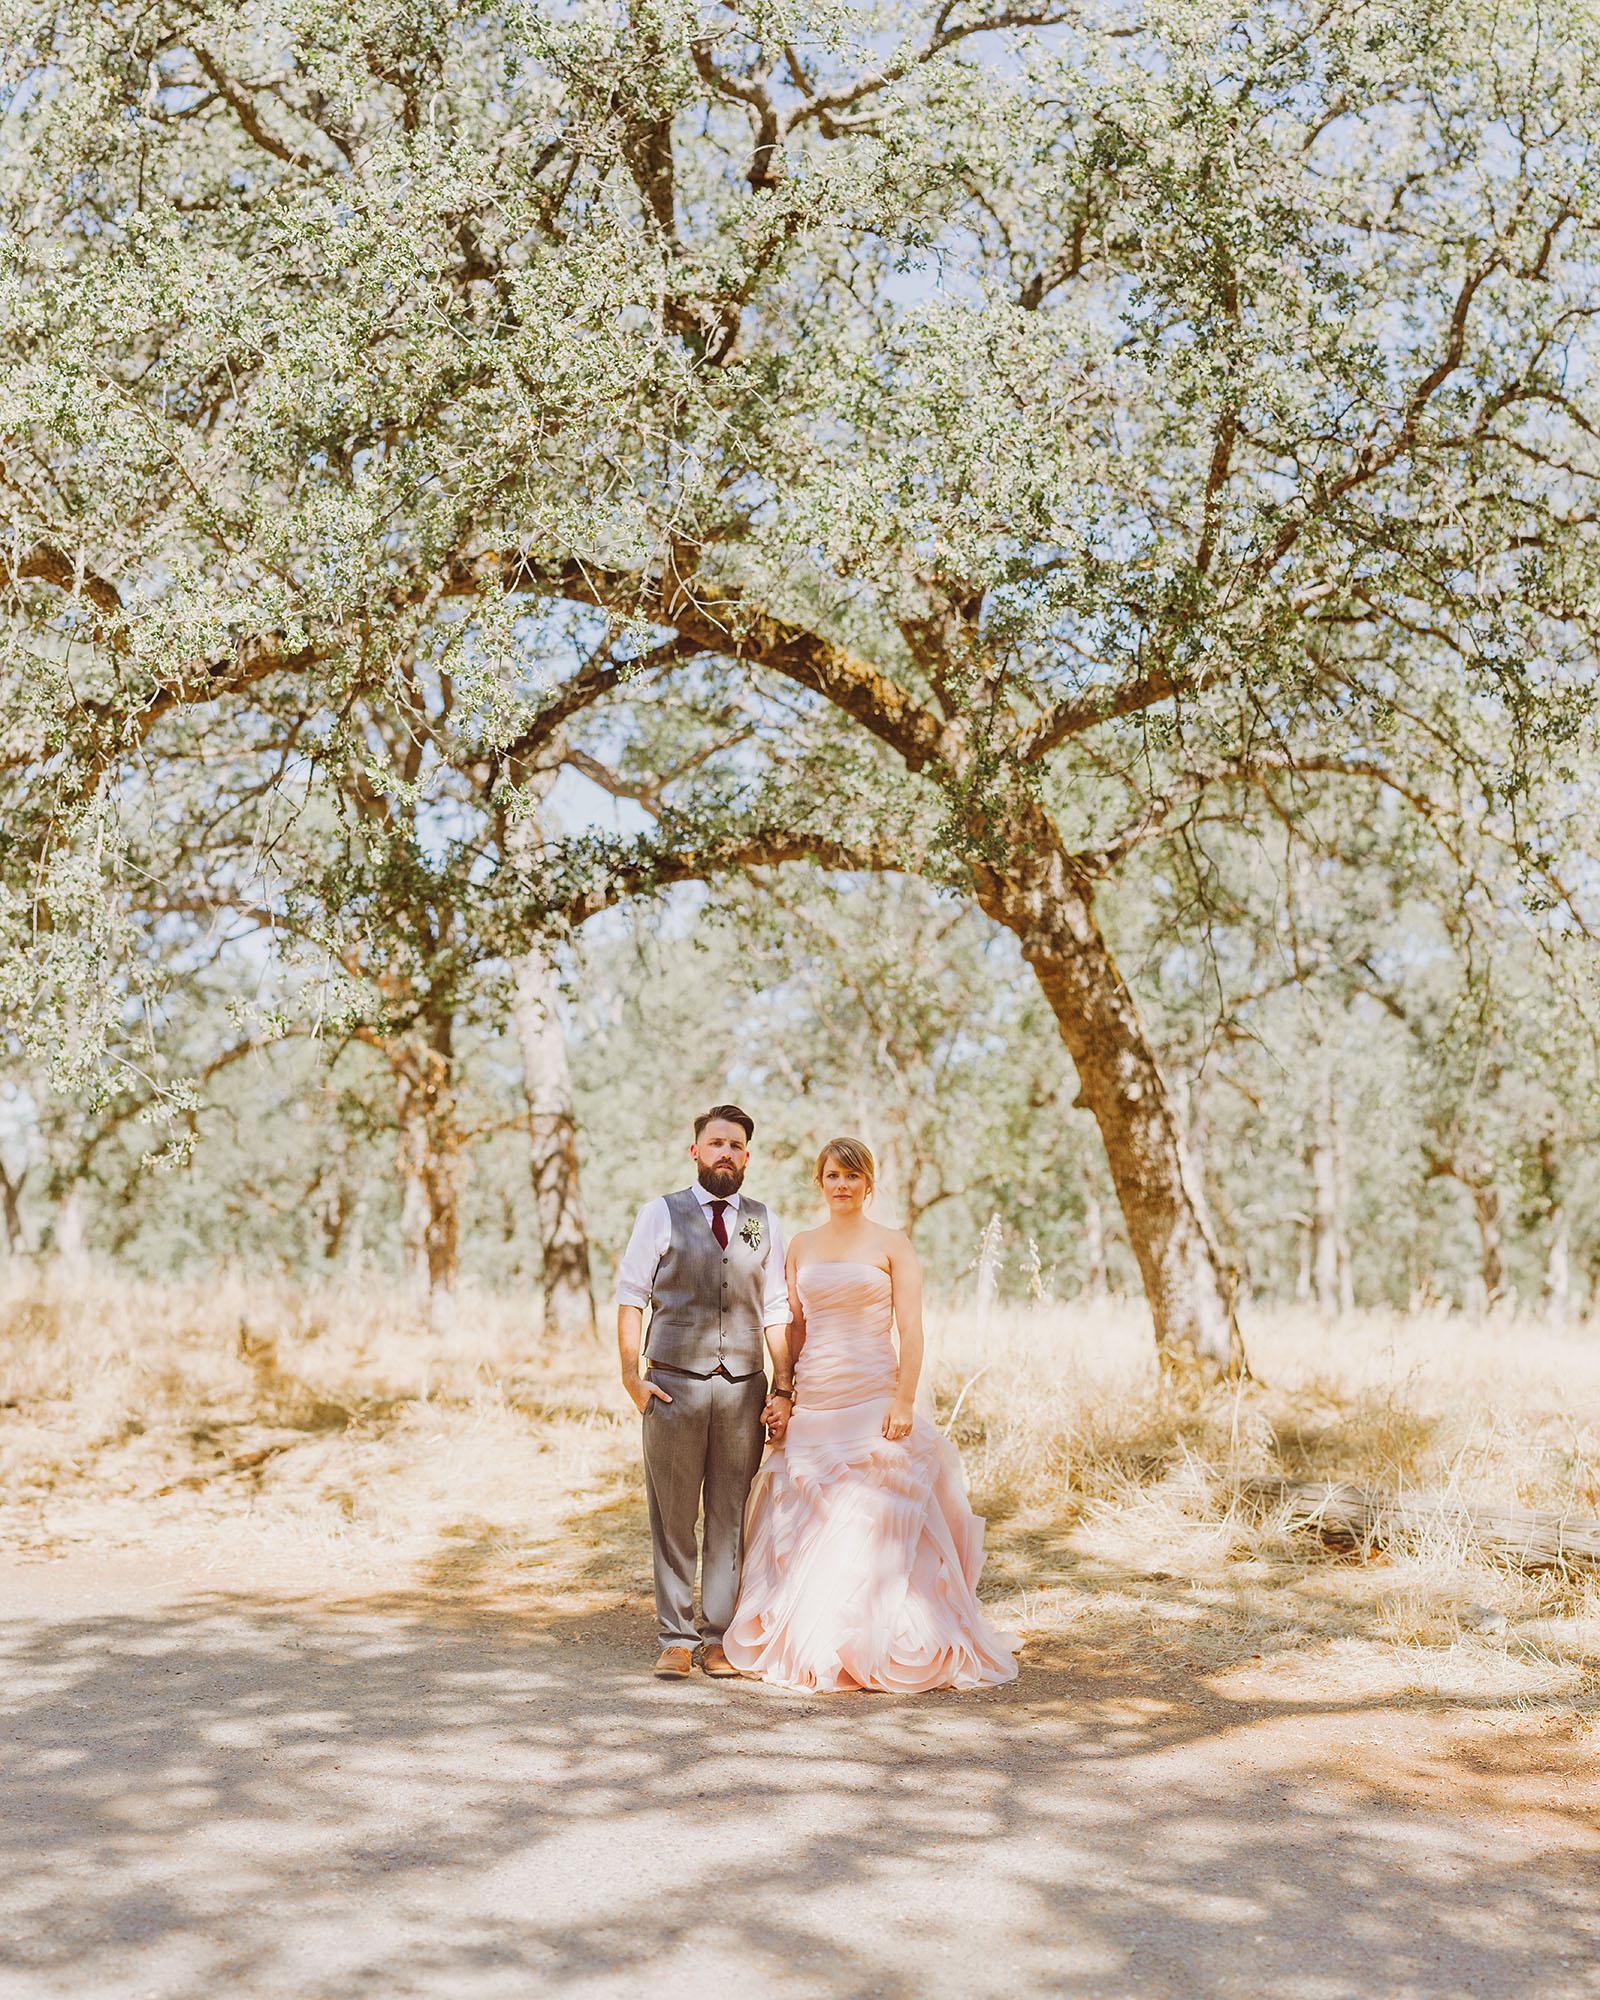 Brenizer Method of Bride and Groom under oak trees in Bidwell Park | Backyard Chico California Wedding